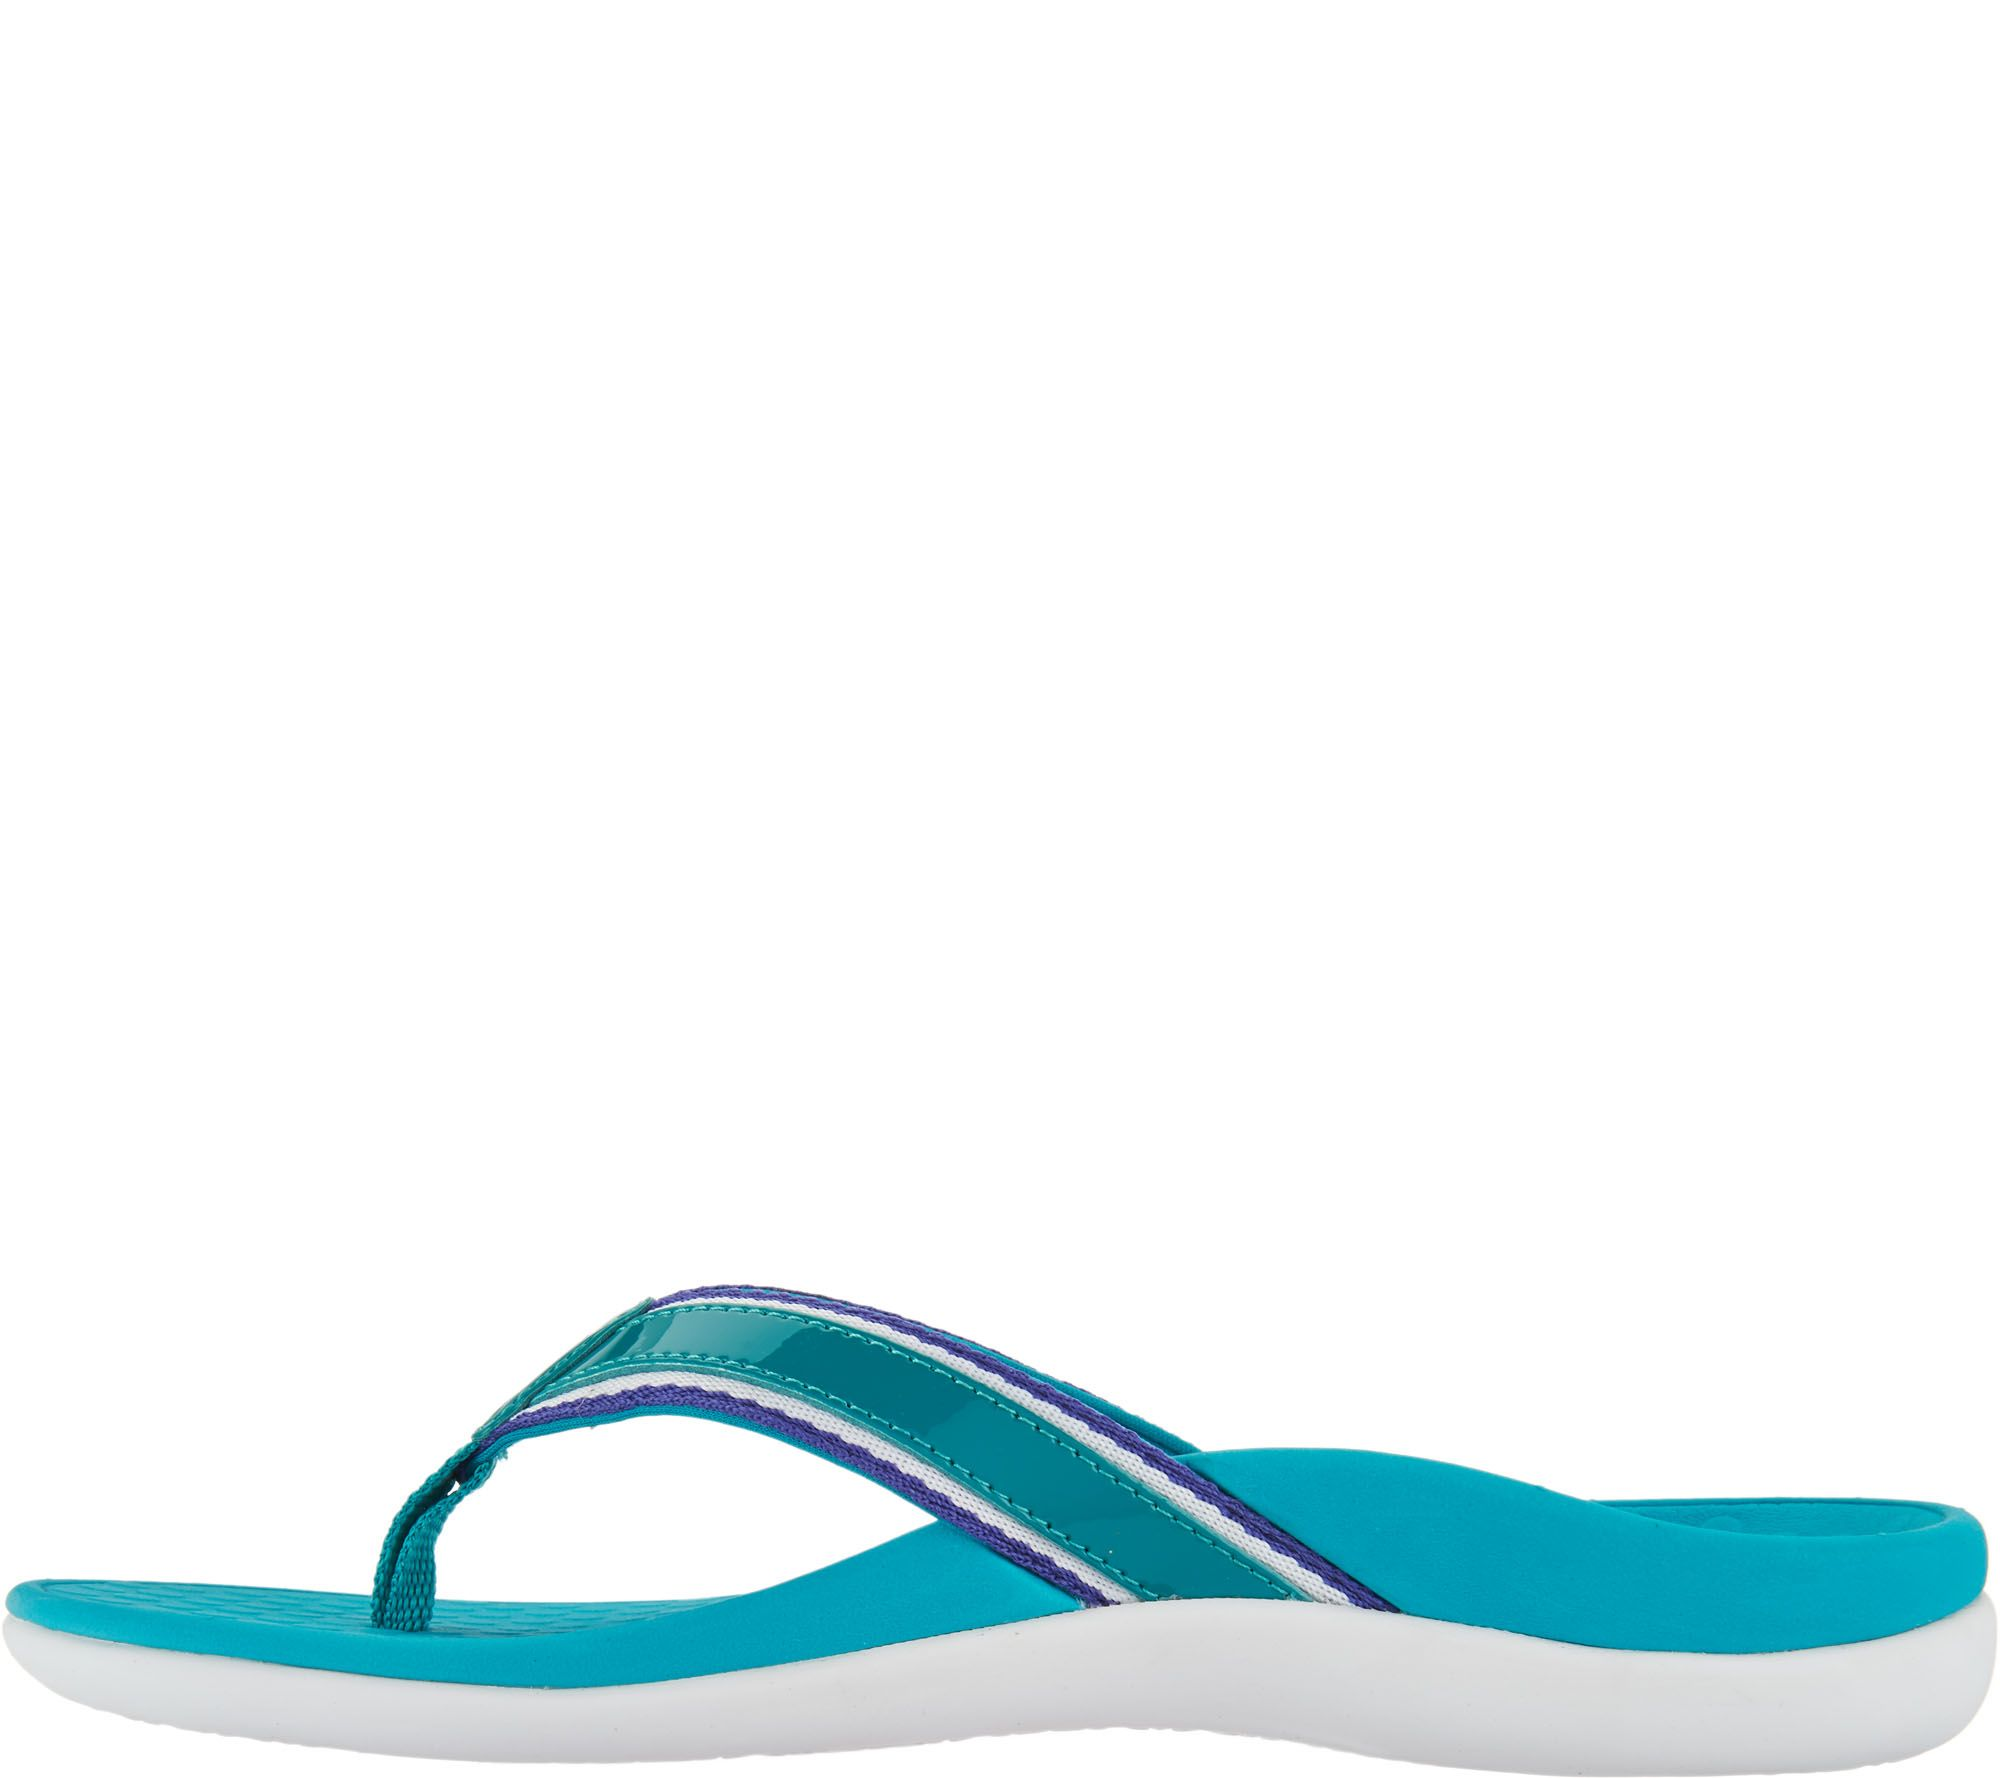 c27920b16100 Vionic Orthotic Stripe Leather Thong Sandal - Tide Sport - Page 1 — QVC.com